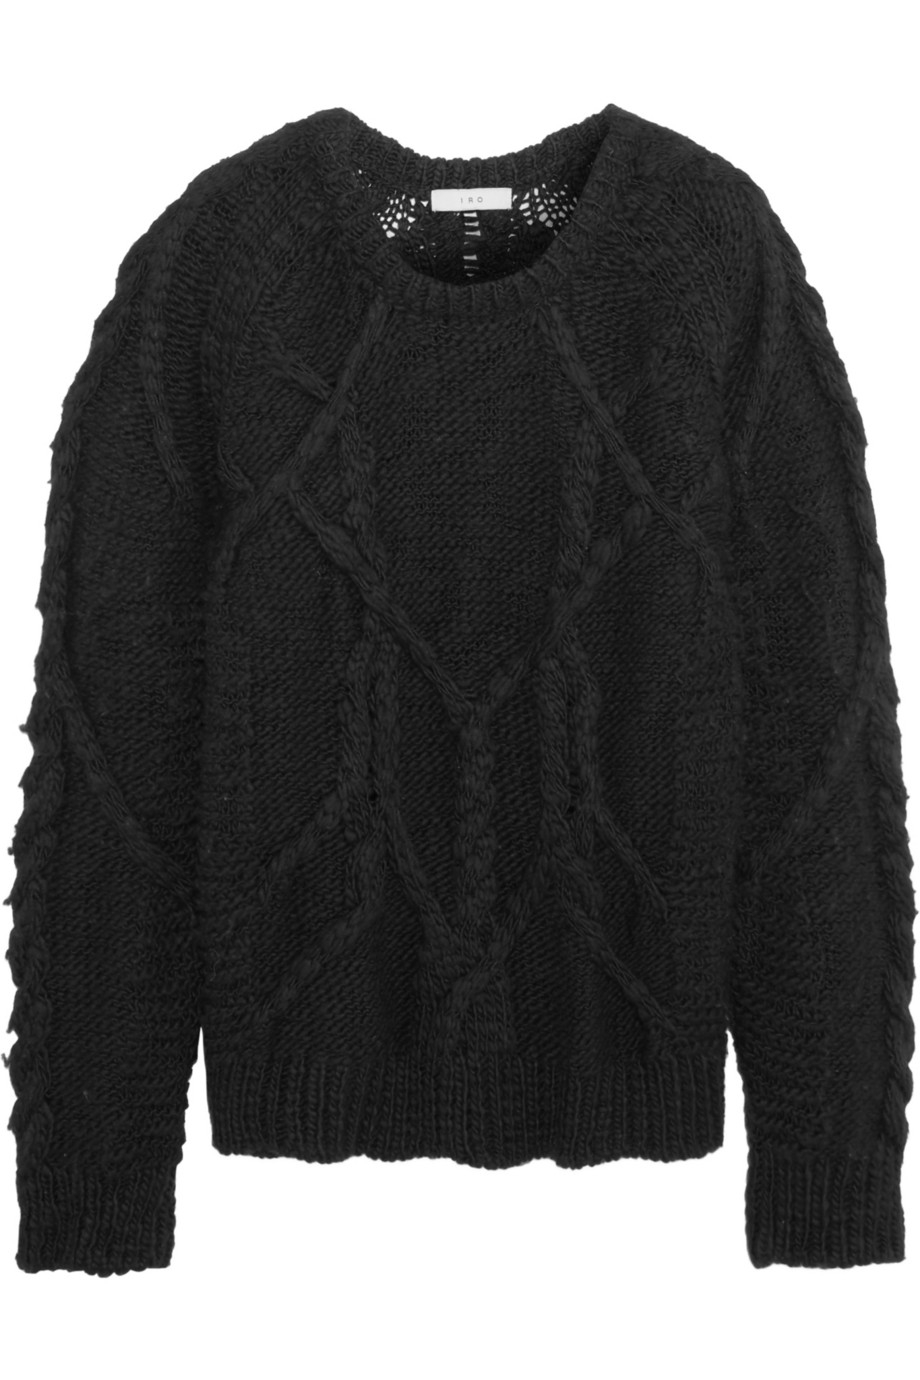 Iro Benita Cable-Knit Merino Wool Sweater in Black | Lyst